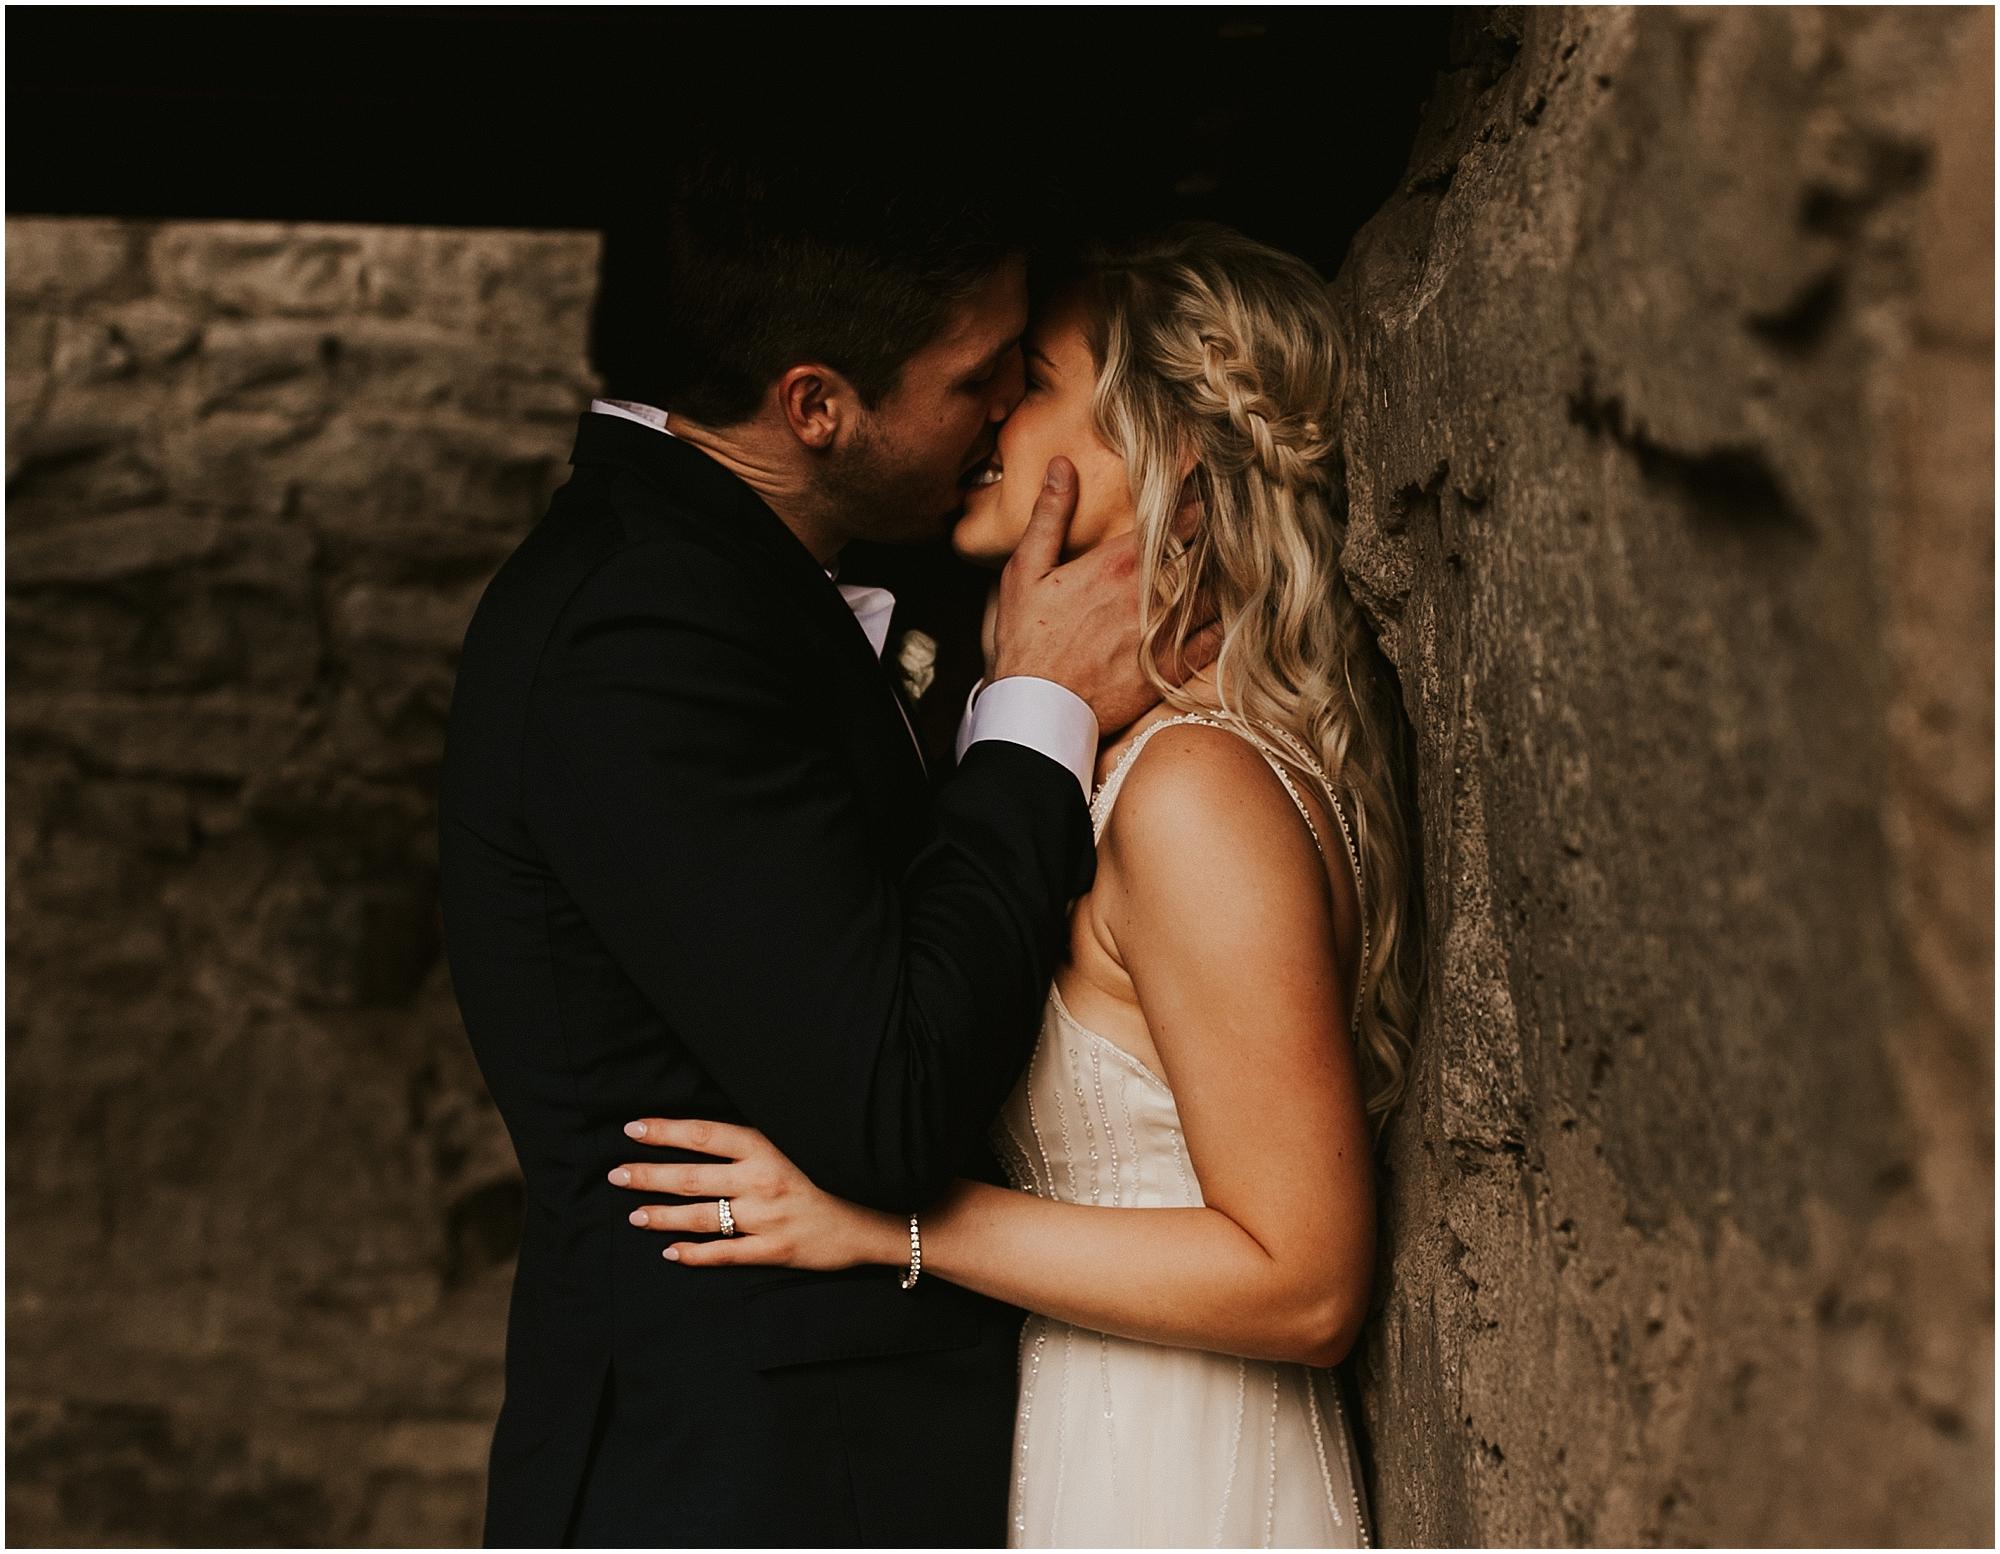 Chateau Rive Spokane Wedding Cassie Trottier Photography1121.jpg